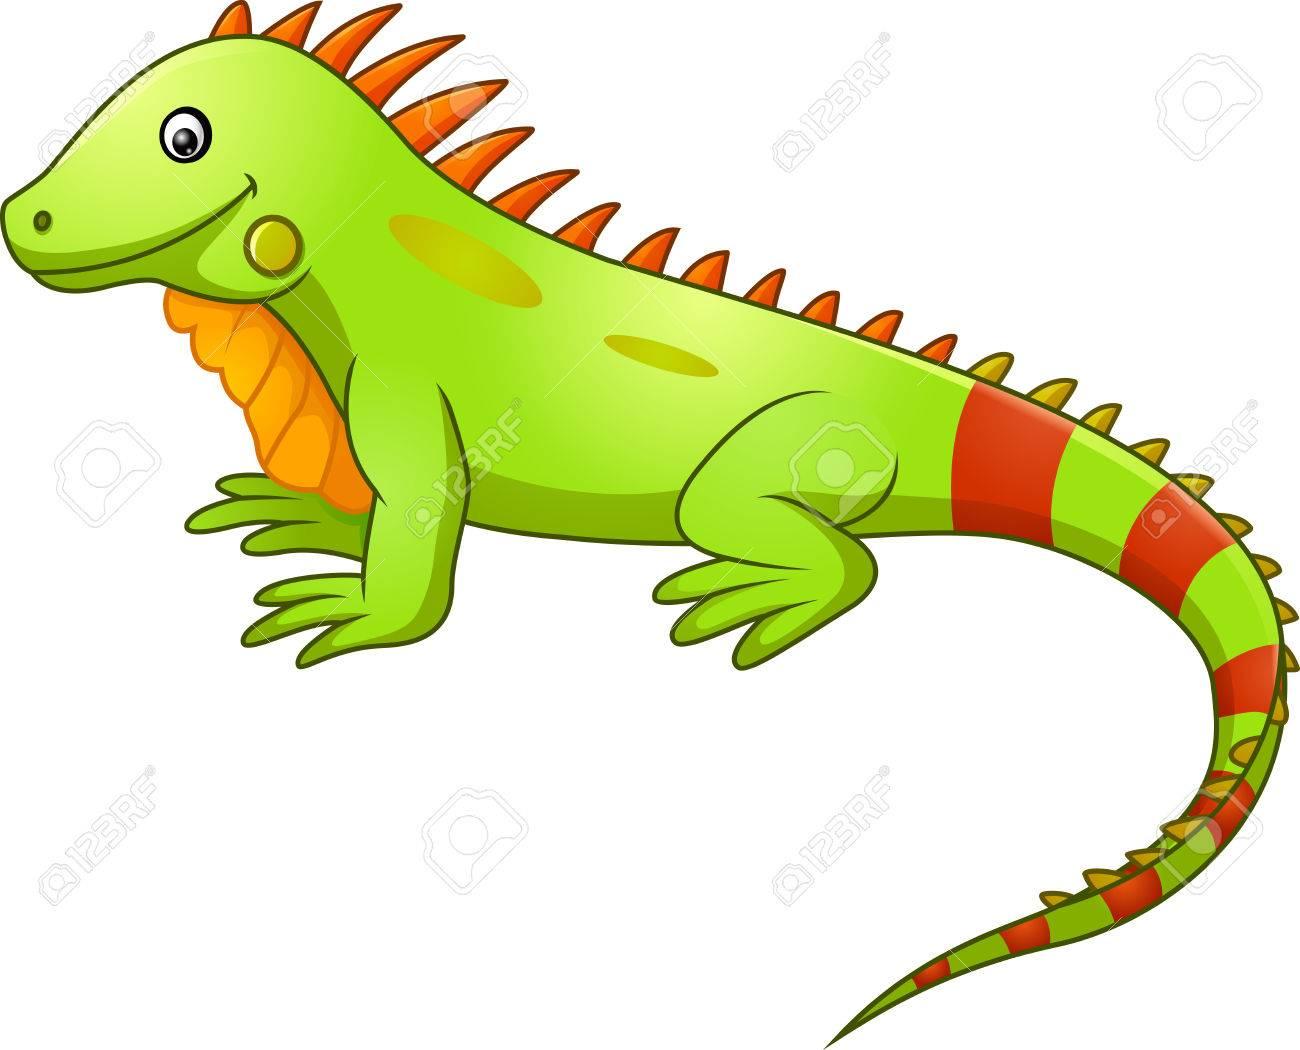 cute iguana cartoon royalty free cliparts vectors and stock rh 123rf com iguana clipart outline iguana clip art free images